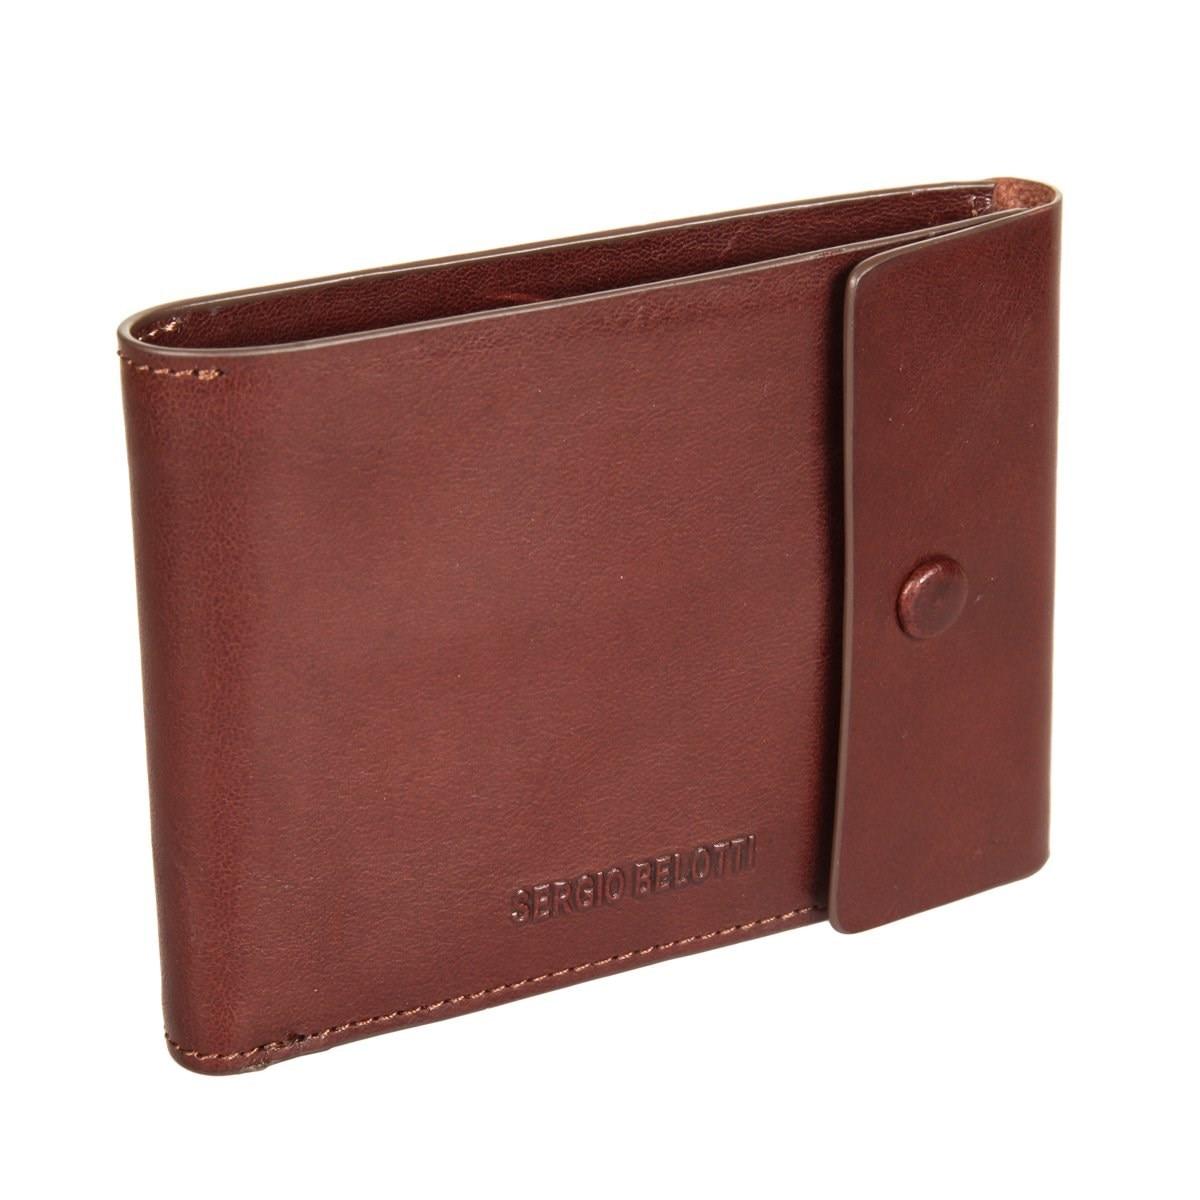 Coin Purse Sergio Belotti 3590A IRIDO Brown simple retro split leather coin purse w belt buckle brown